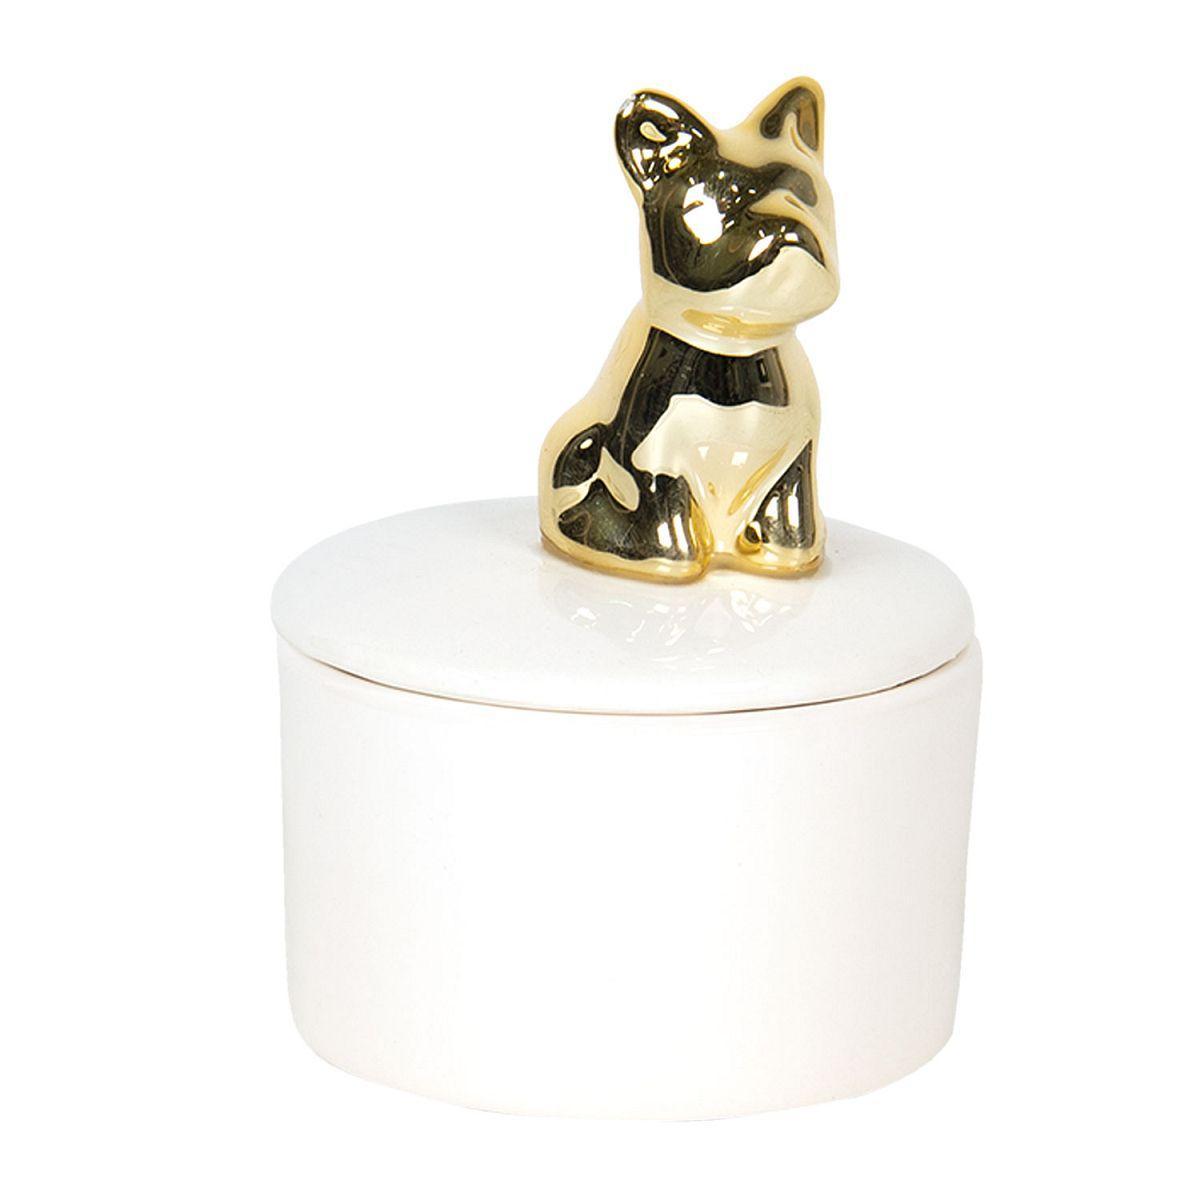 Šperkovnice DOG